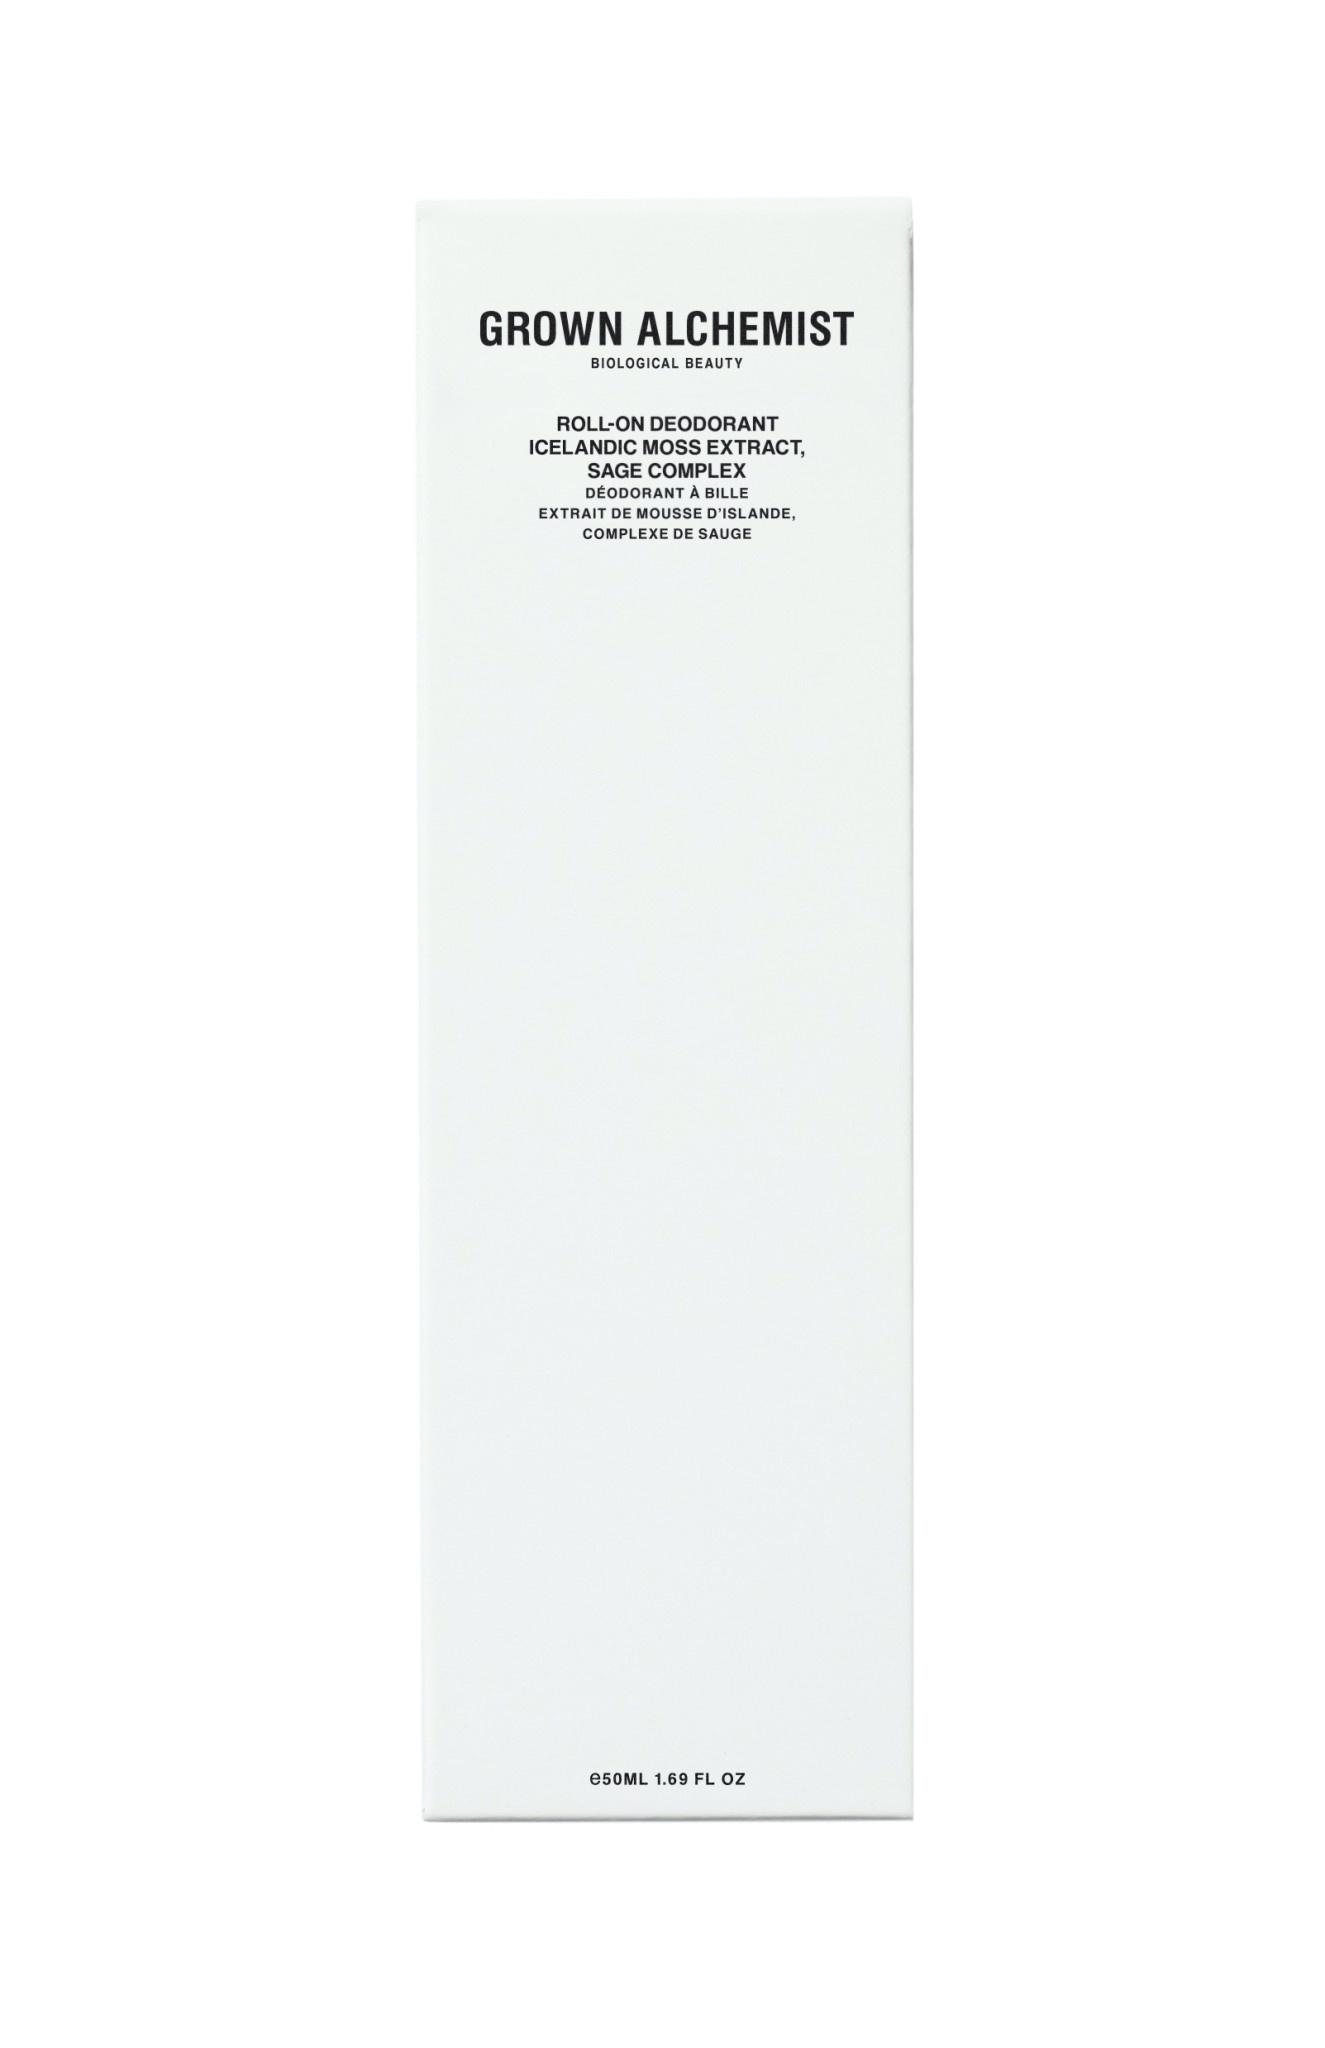 Roll-on deodorant 50ML-2